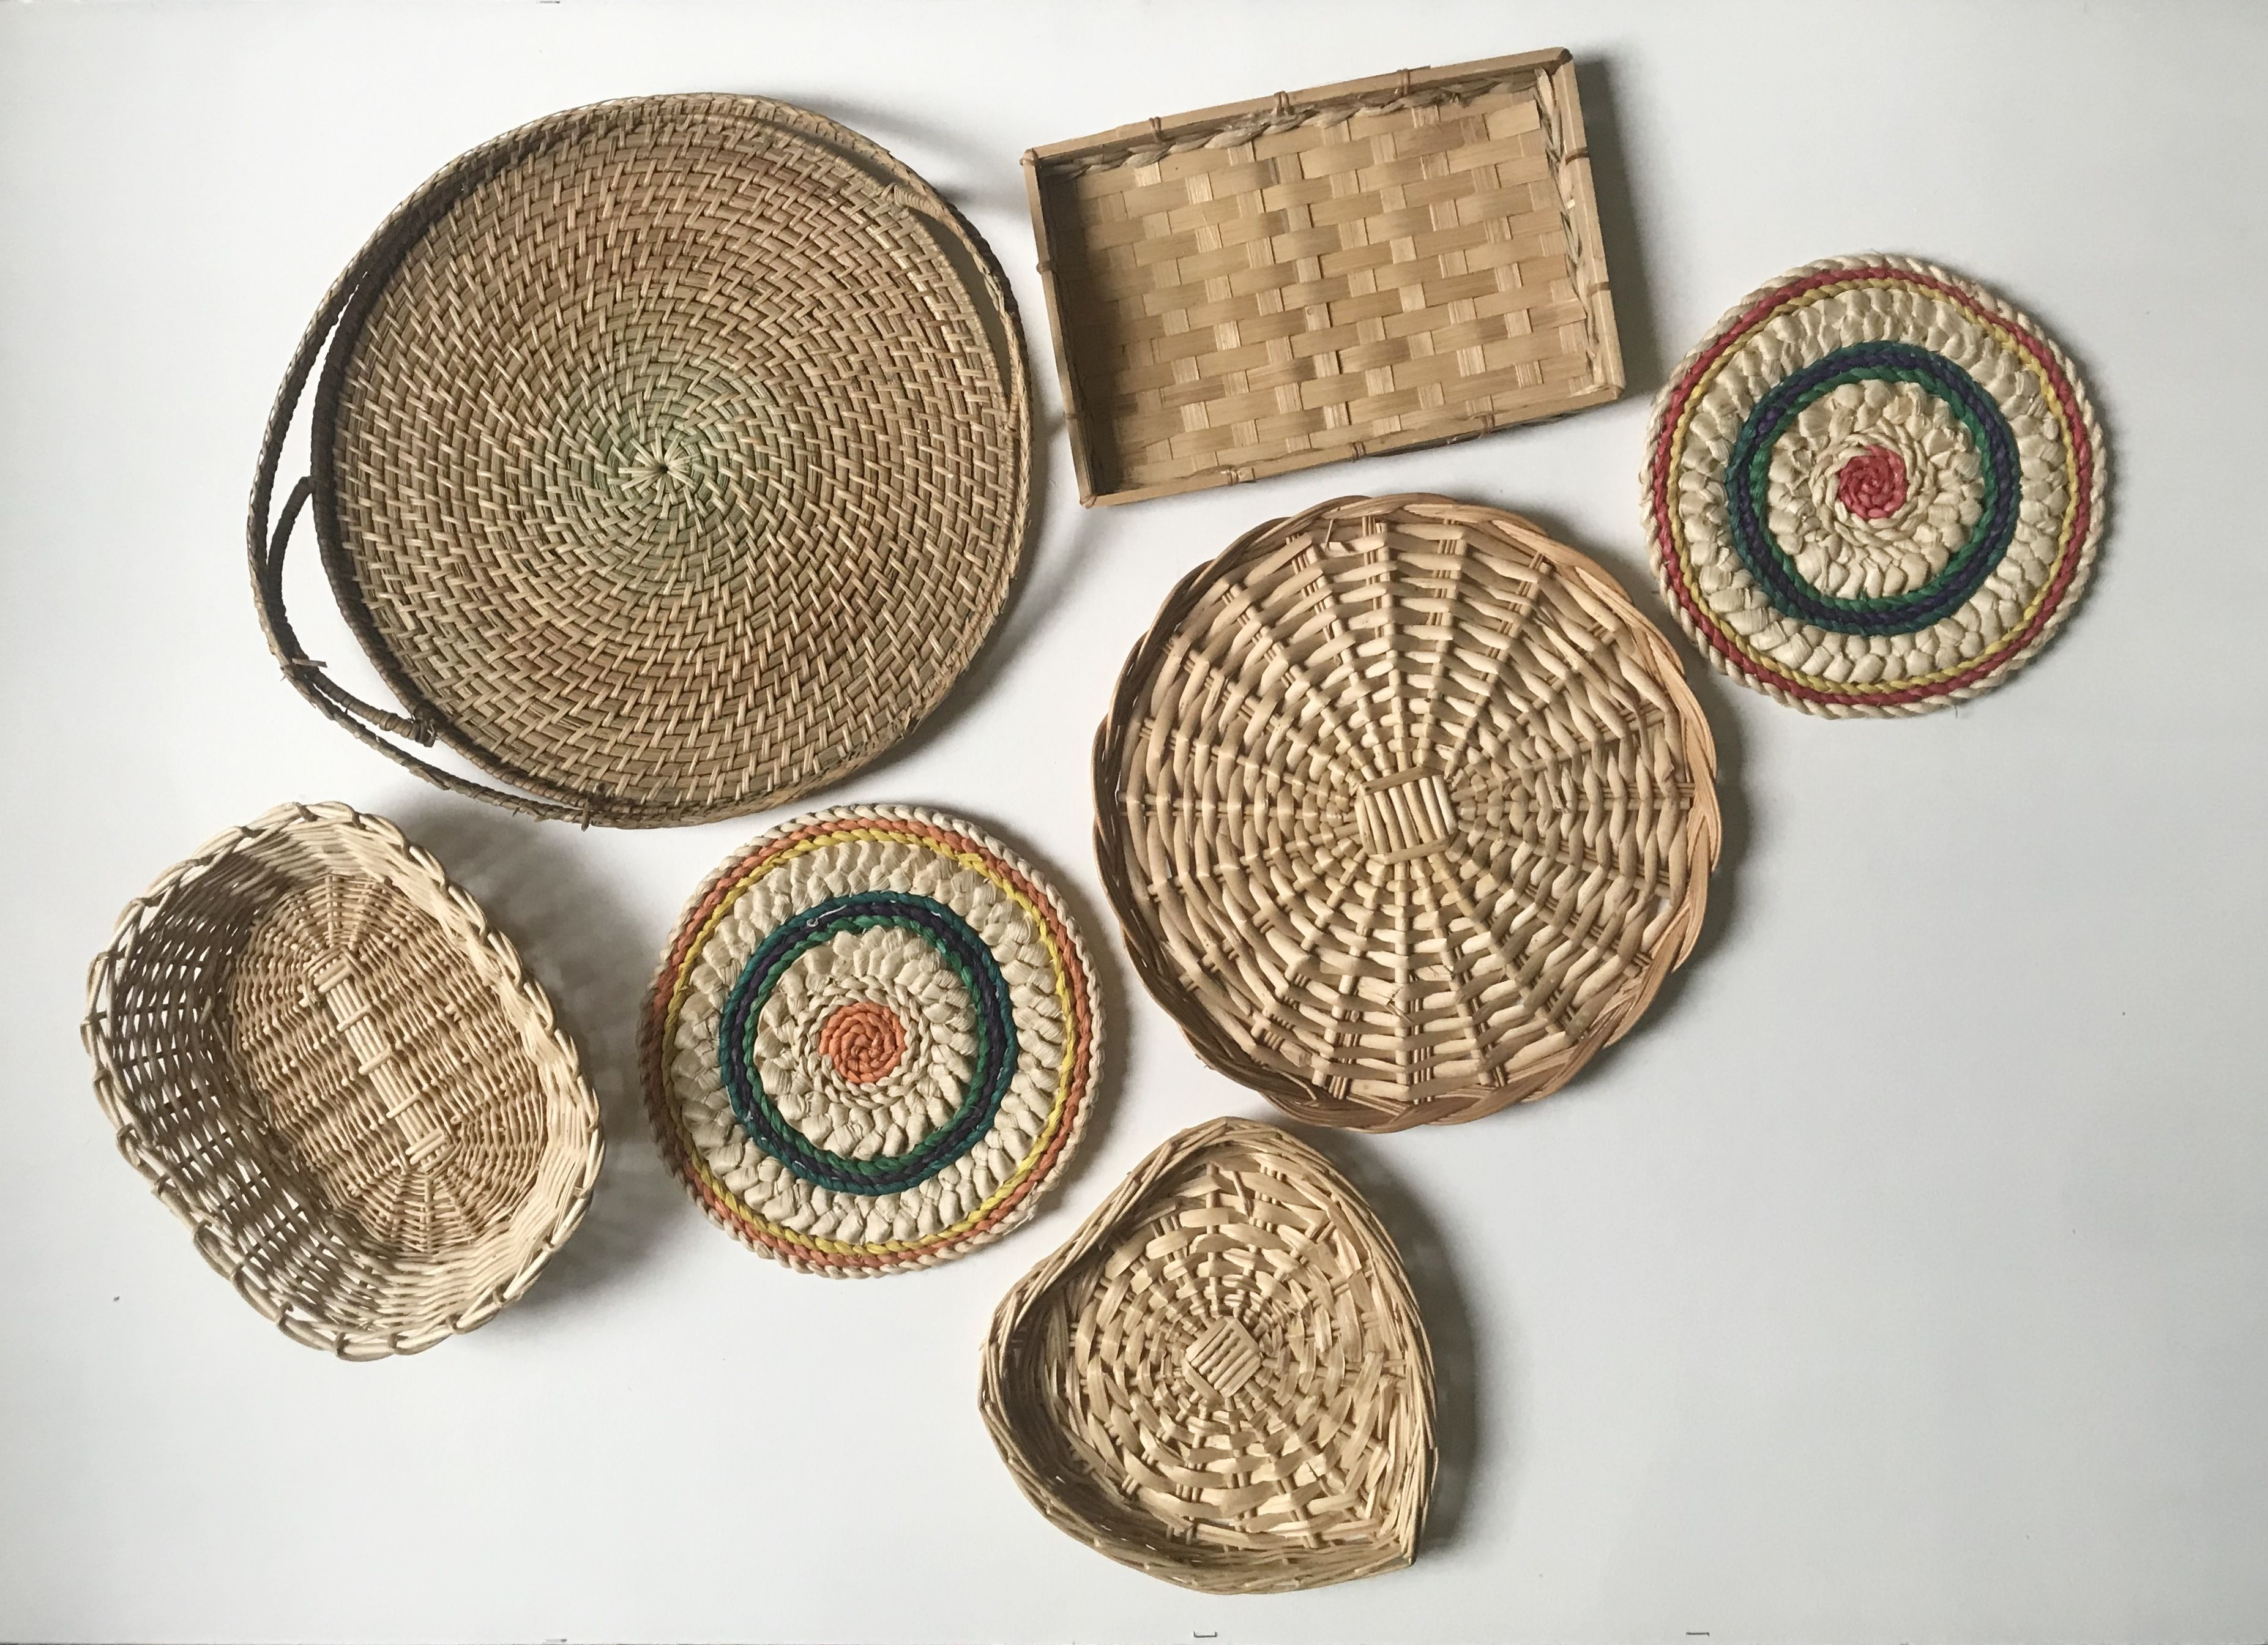 #panierdécoratifmural  #panierosier #vintage #walldecor #vintagehomedecor #macramewallhanging #macrame #crochet #vintagehome #decoration #homedecor #brocanteenligne #brocante #bohemechic #decoboheme #bohodecor #bohowallhanging #bohowalldecor